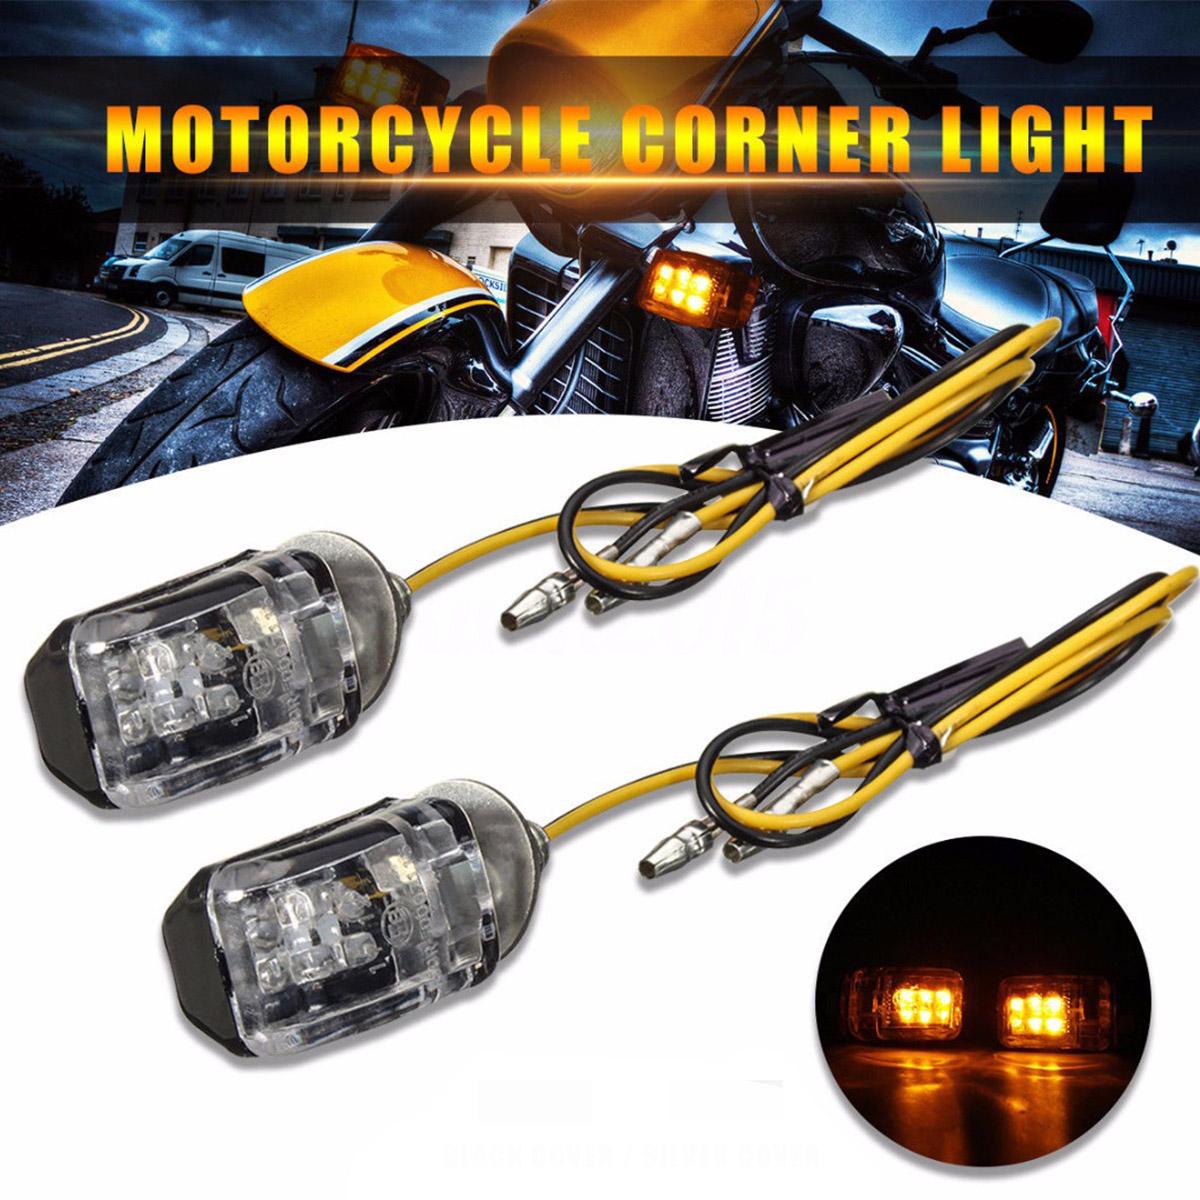 2X Turn Signal LED Motorcycle Light Blinker Indicator Mini For Honda Kawasaki